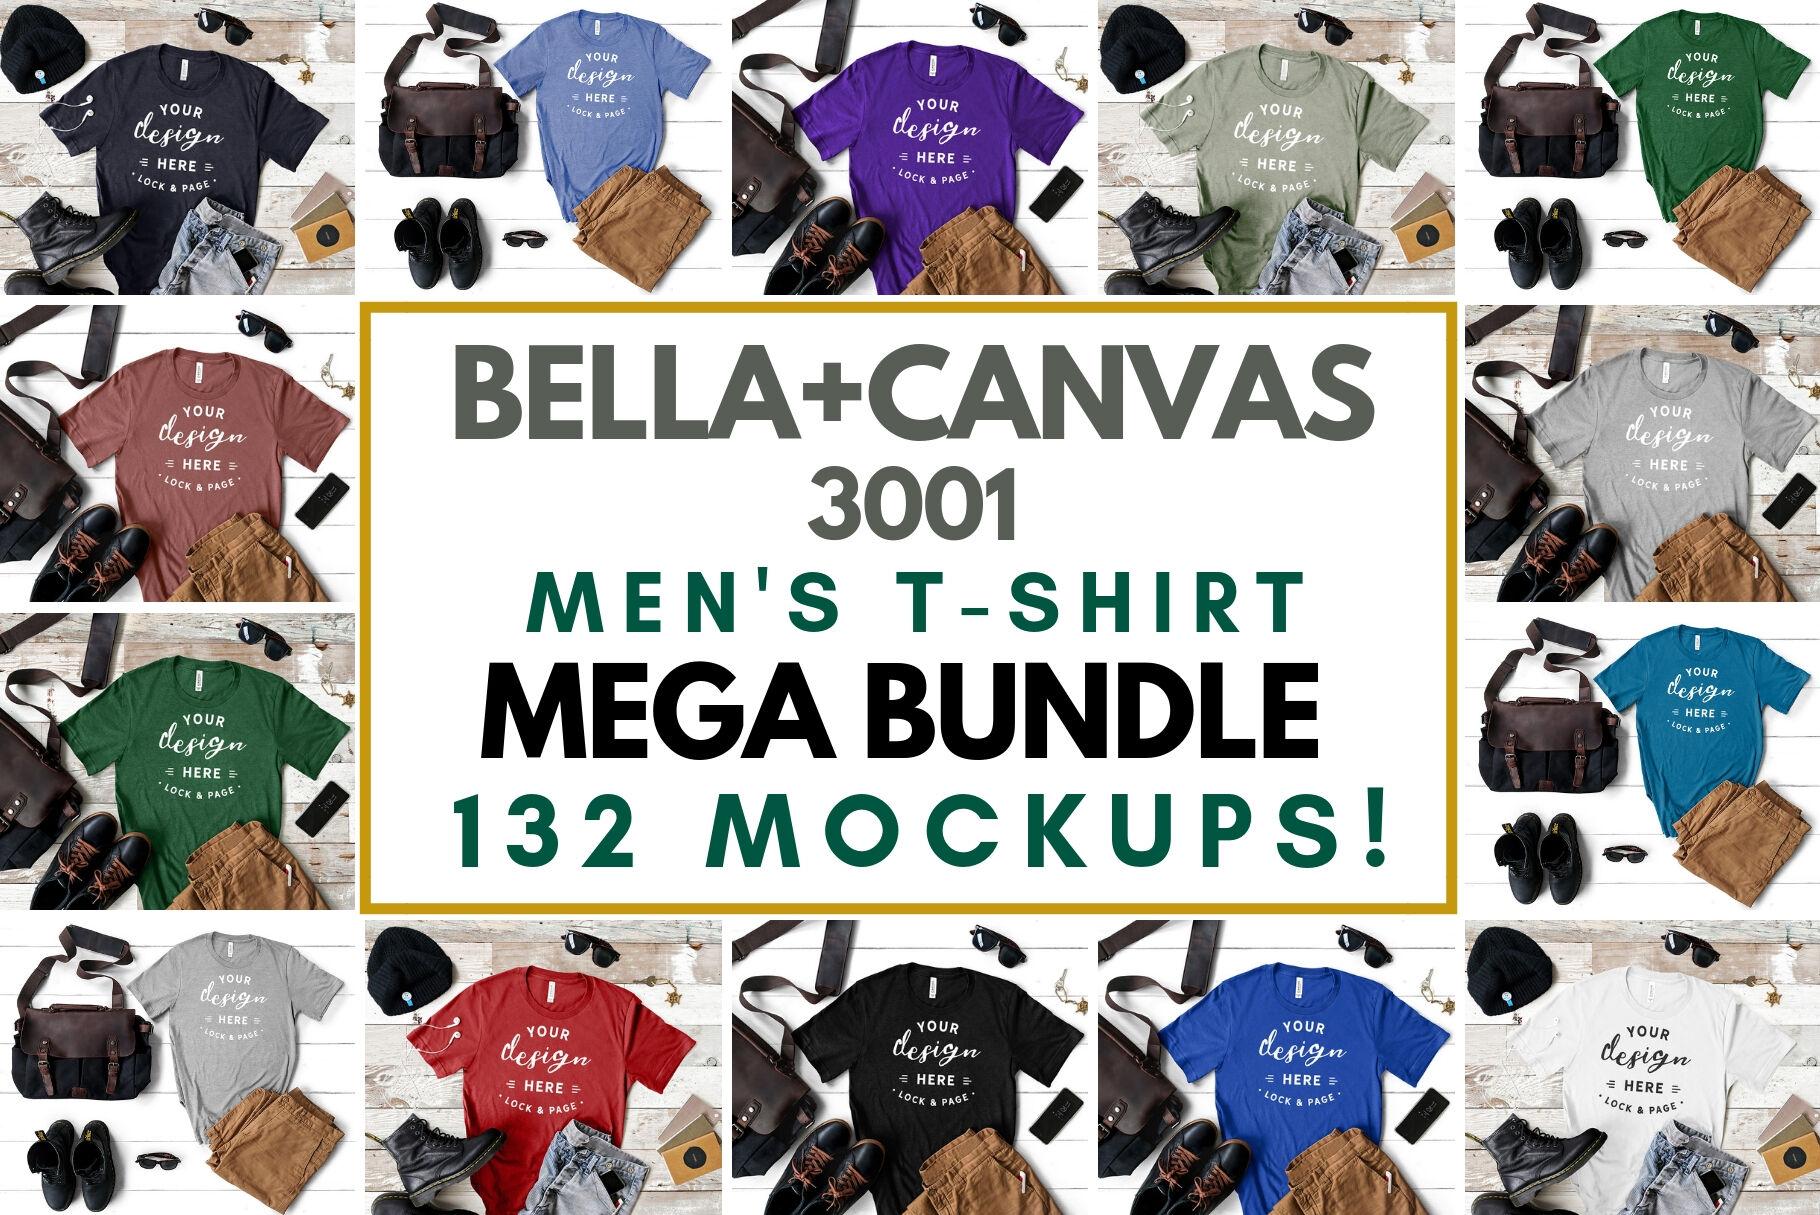 The Ultimate TShirt Mockup Mega Bundle, Bella Canvas Next